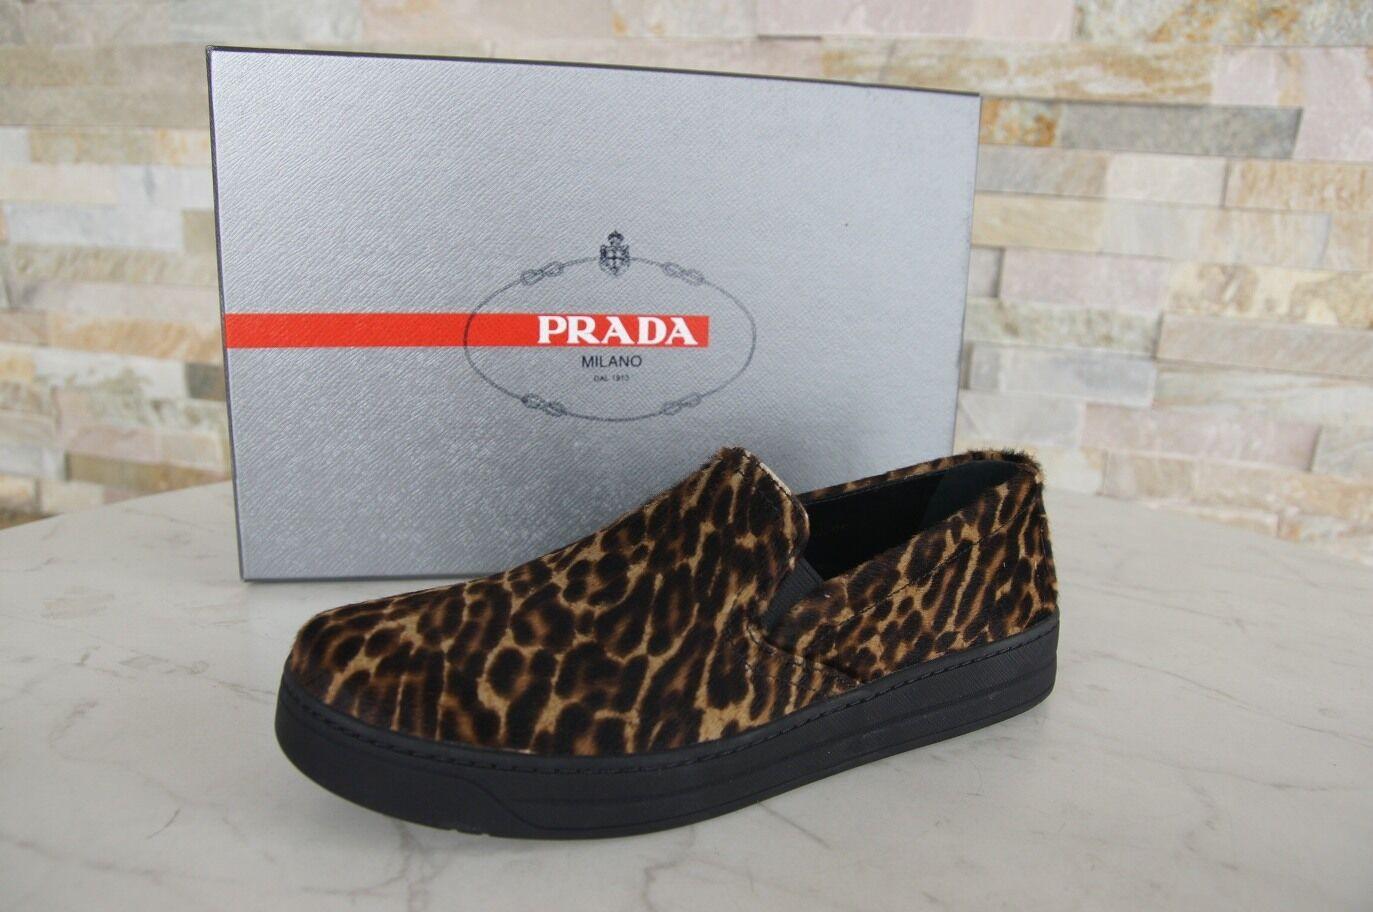 PRADA Gr 36,5 Slipper Mokassins NEU Slip-On Schuhe Leopard Kalbsfell NEU Mokassins 6b848e